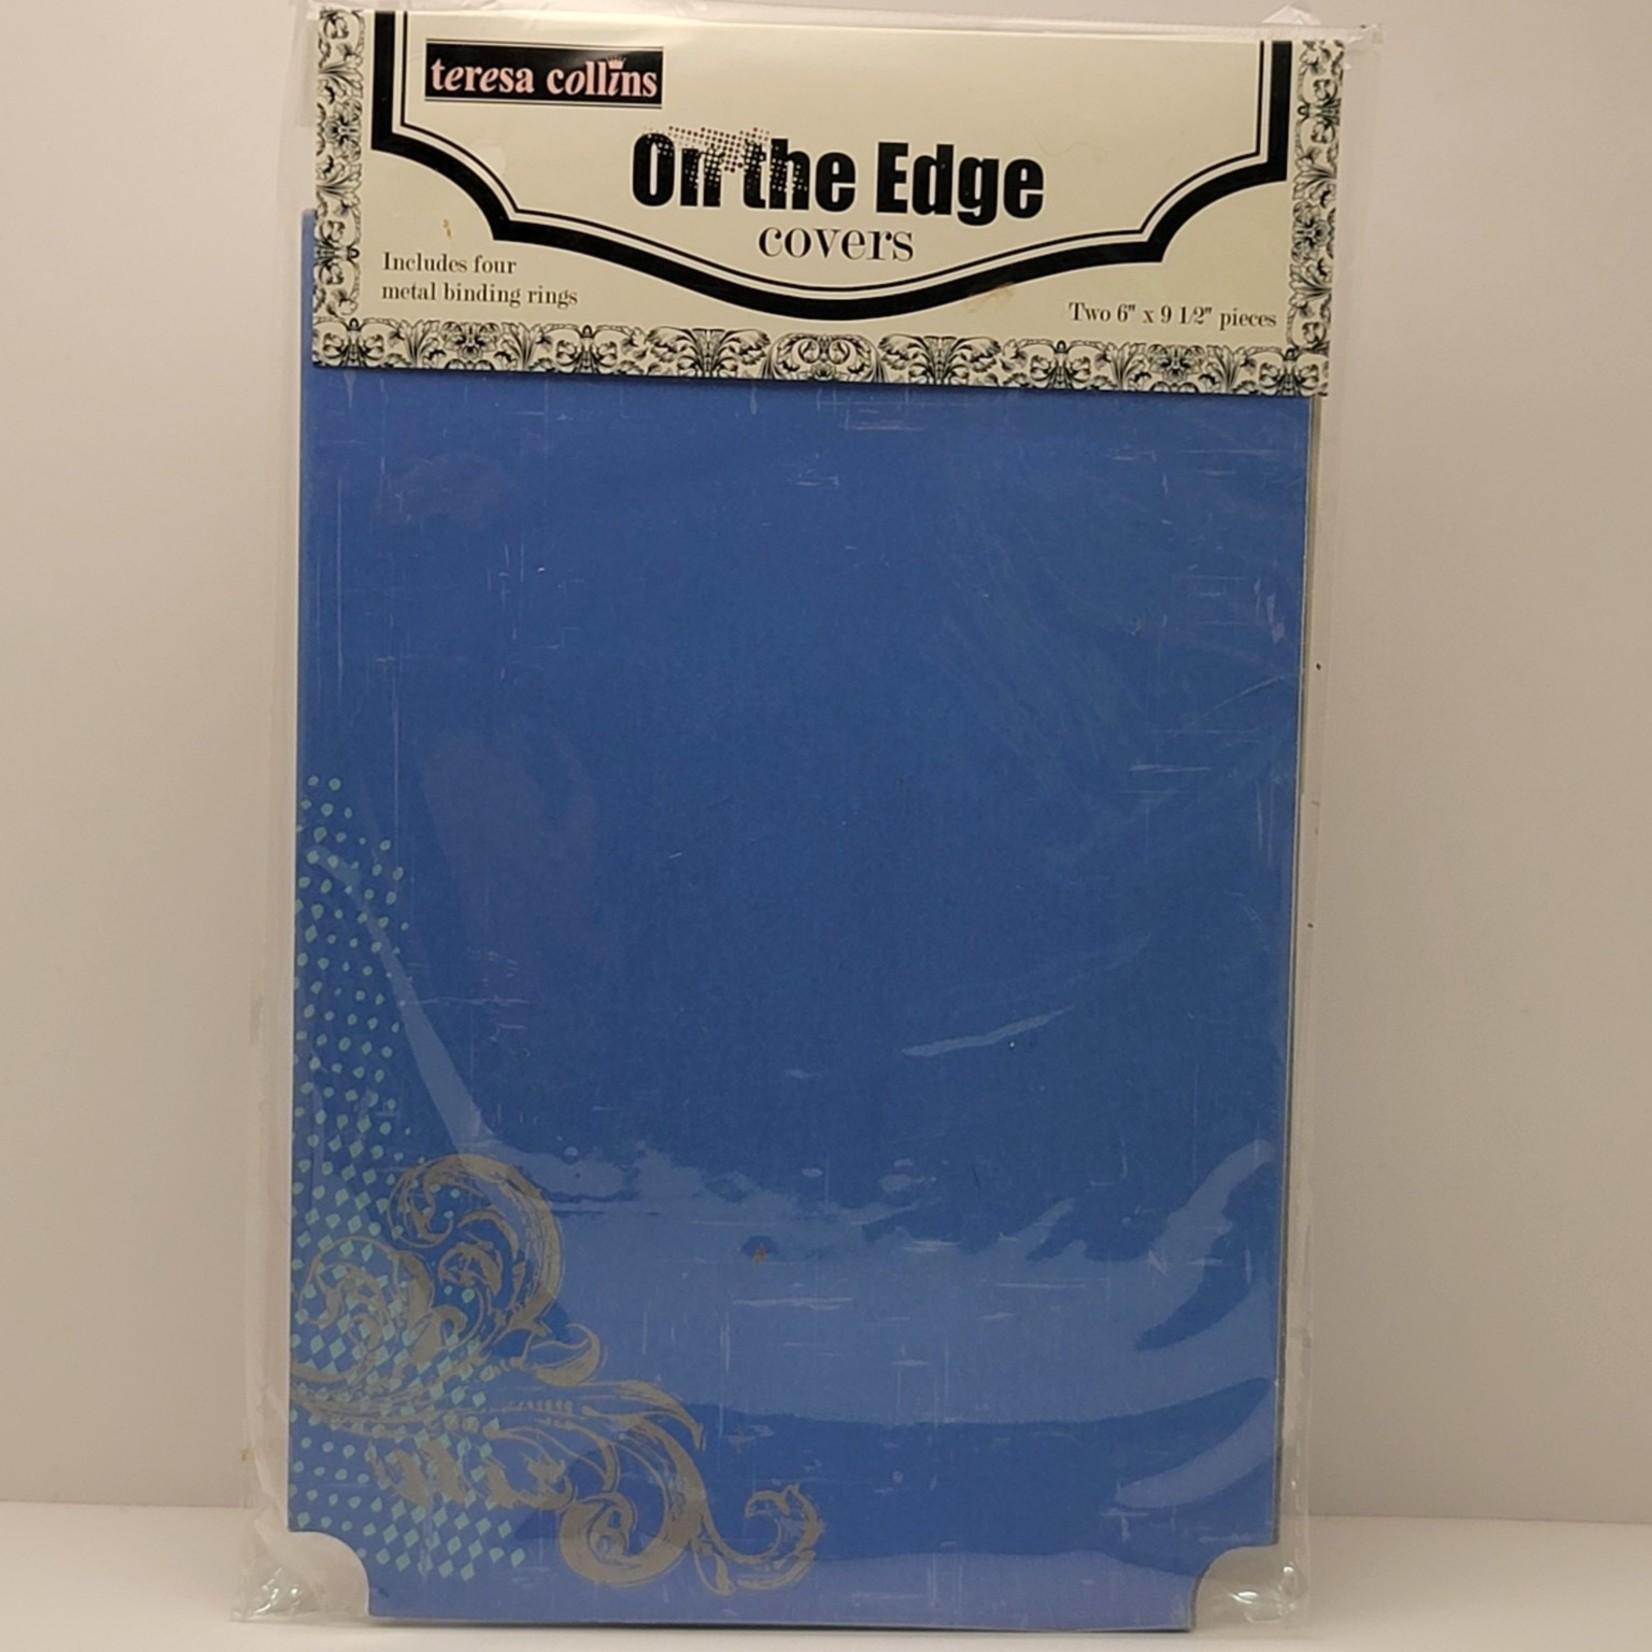 "teresa collins - On the Edge Covers (6"" x 9.5"")"